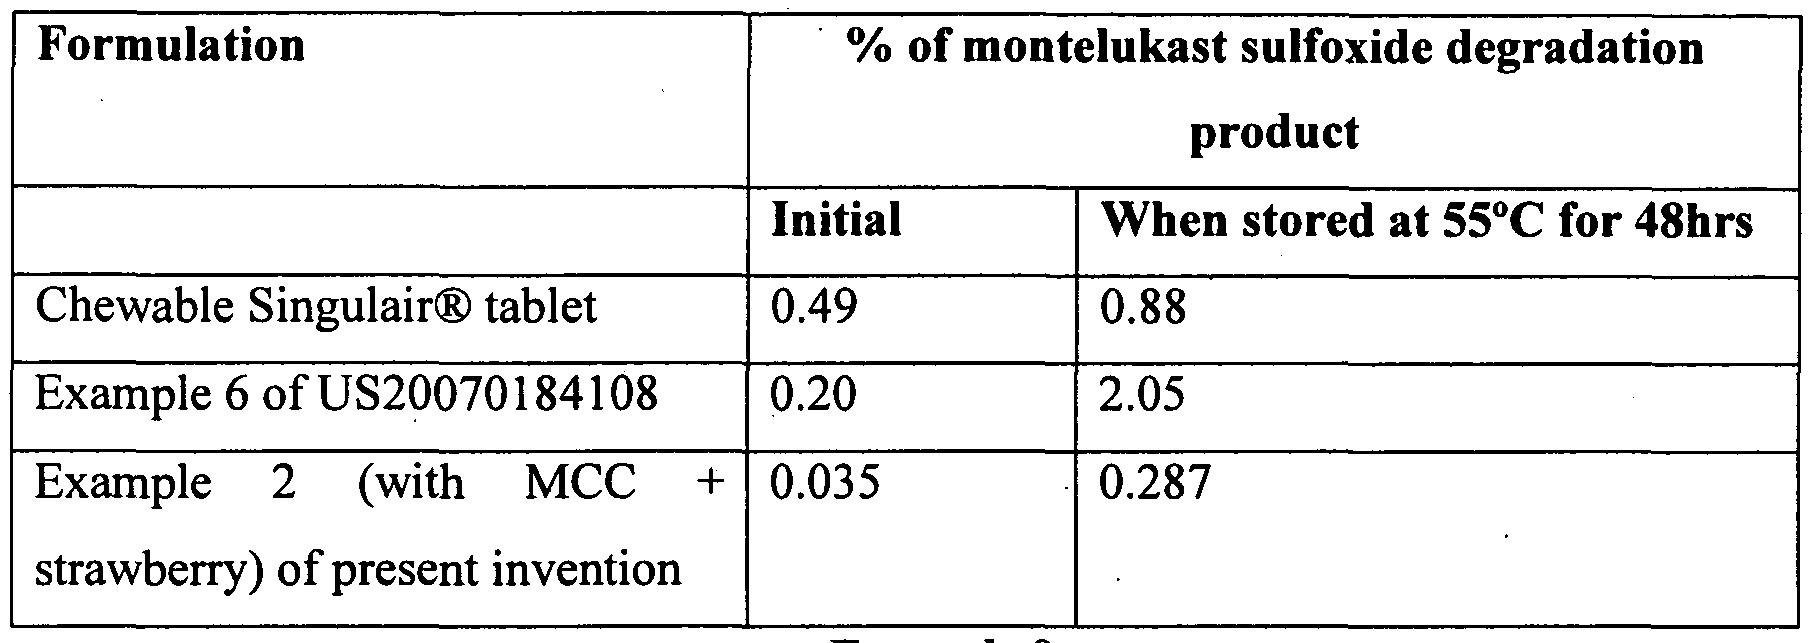 Generic singulair inactive ingredients.doc - Figure Imgf000027_0001